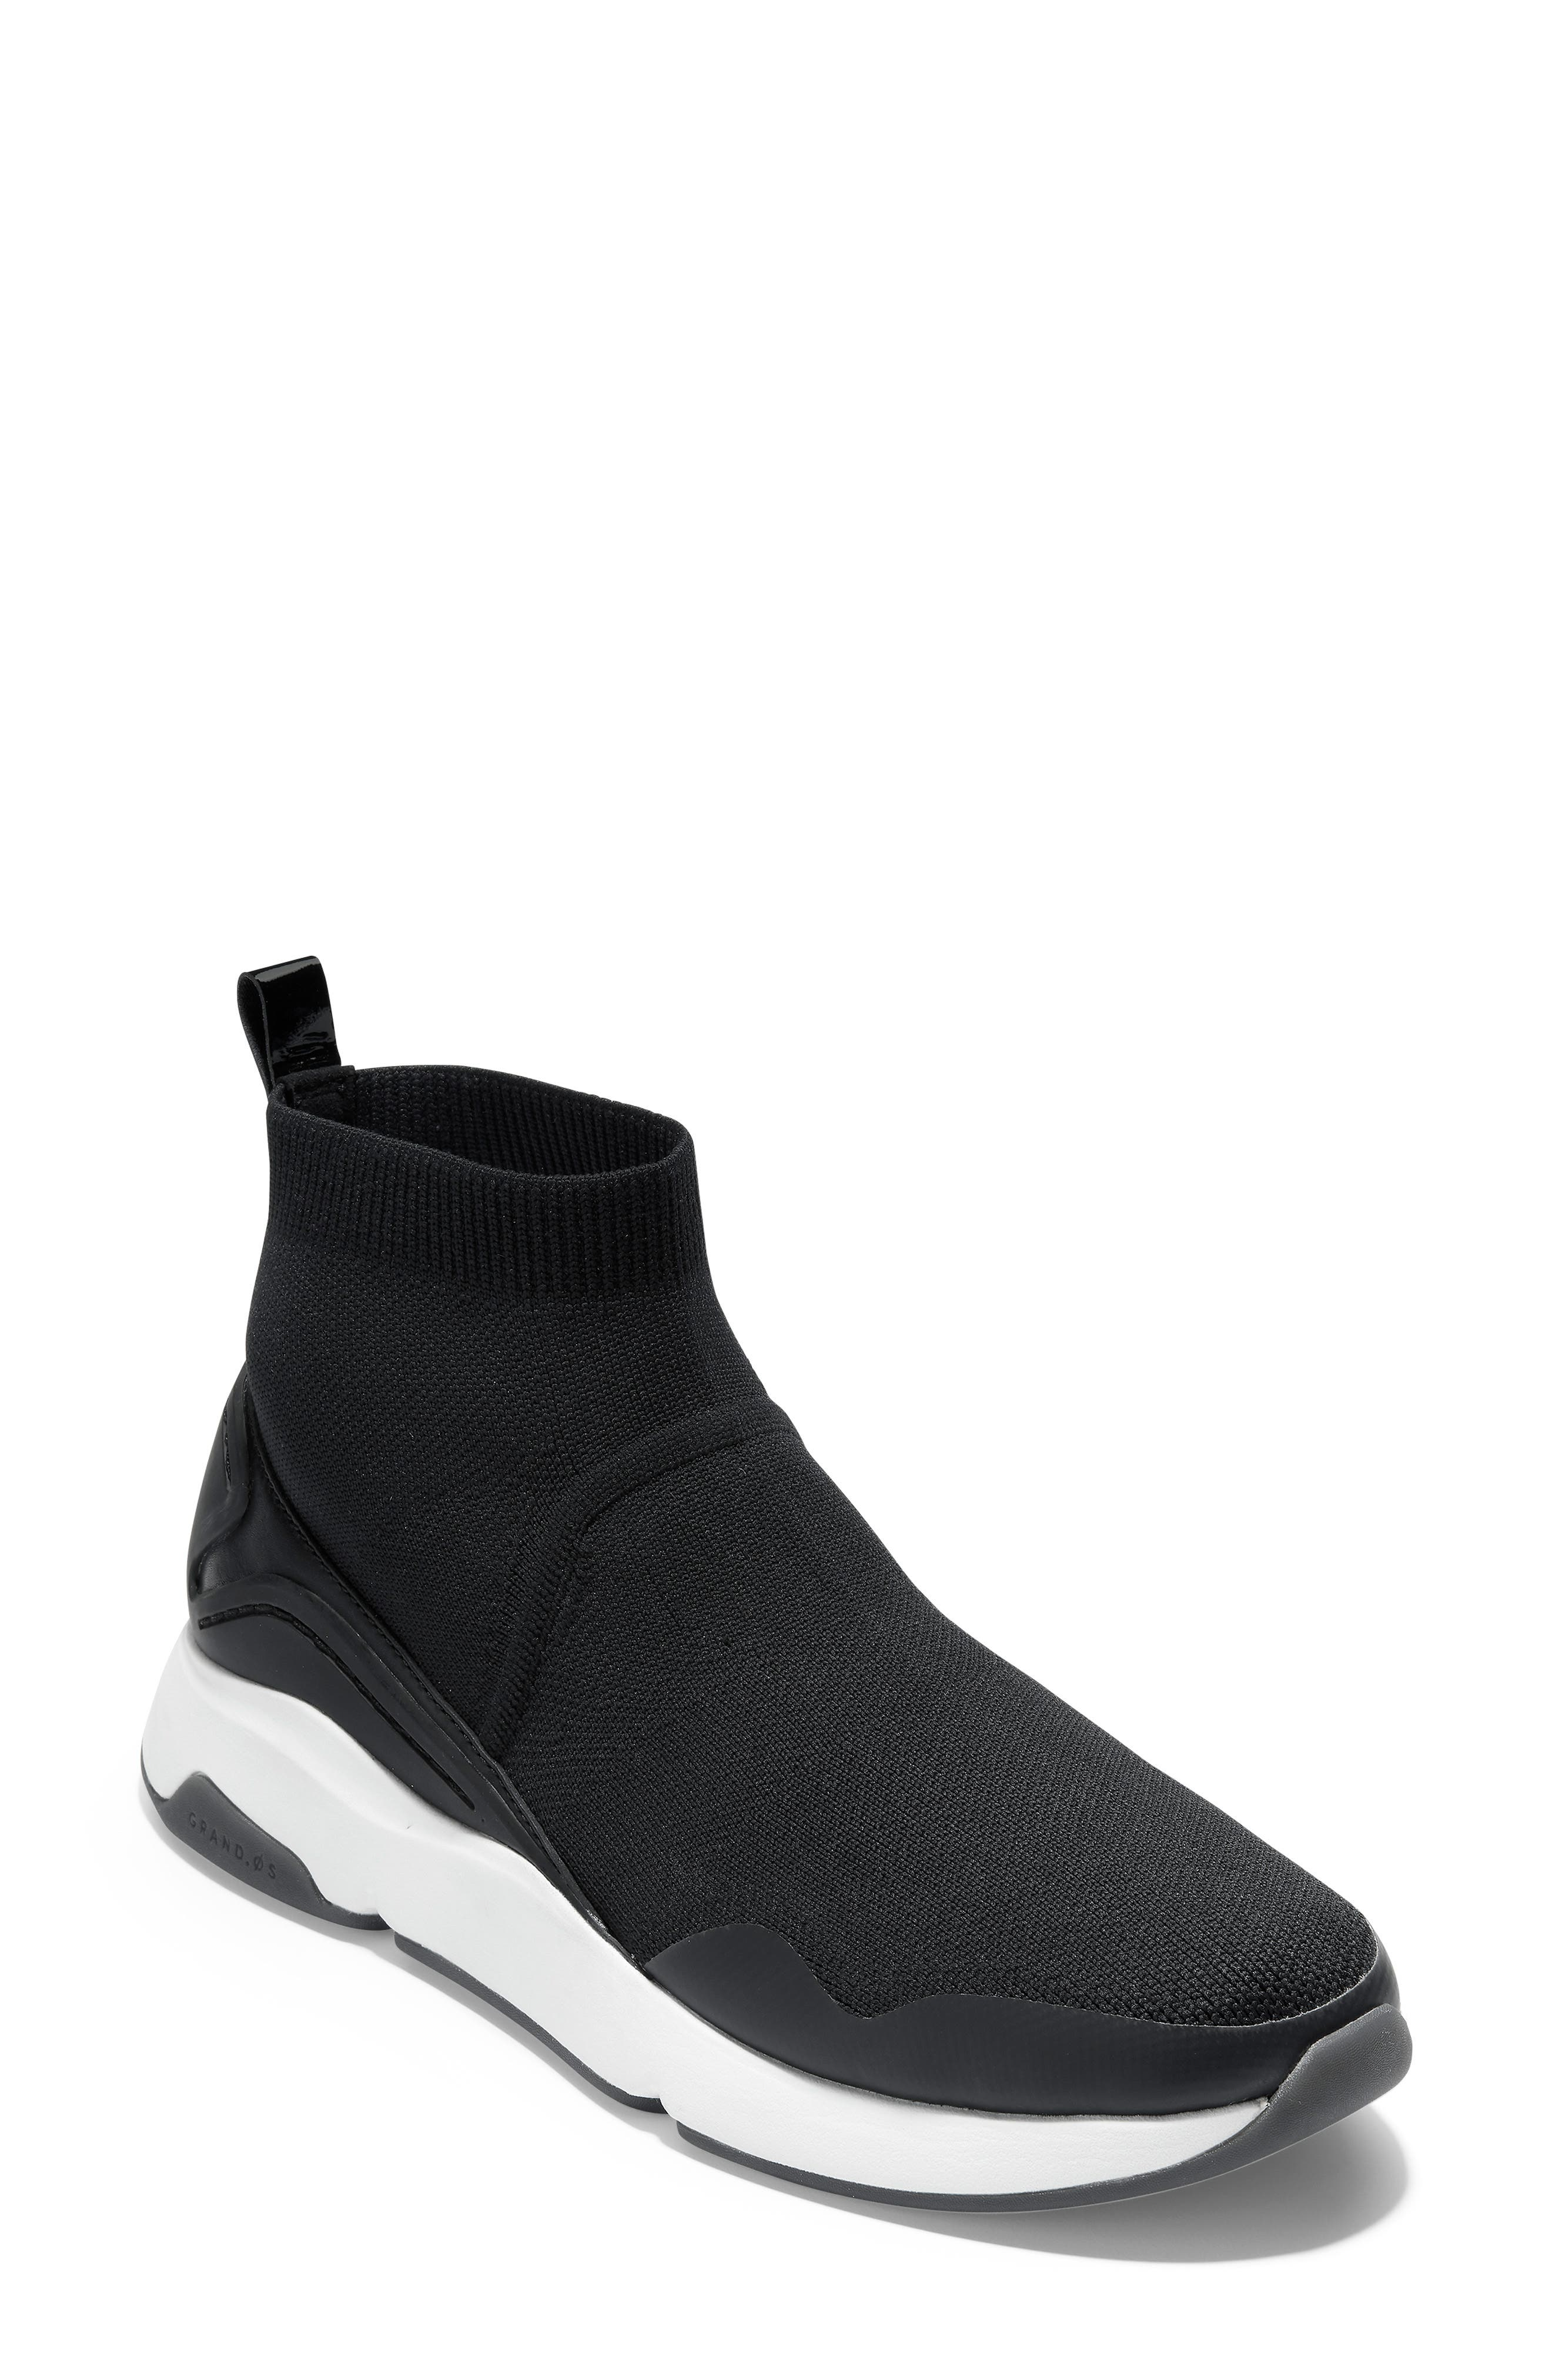 ZeroGrand Motion Slip-On Sneaker,                             Main thumbnail 1, color,                             BLACK LEATHER